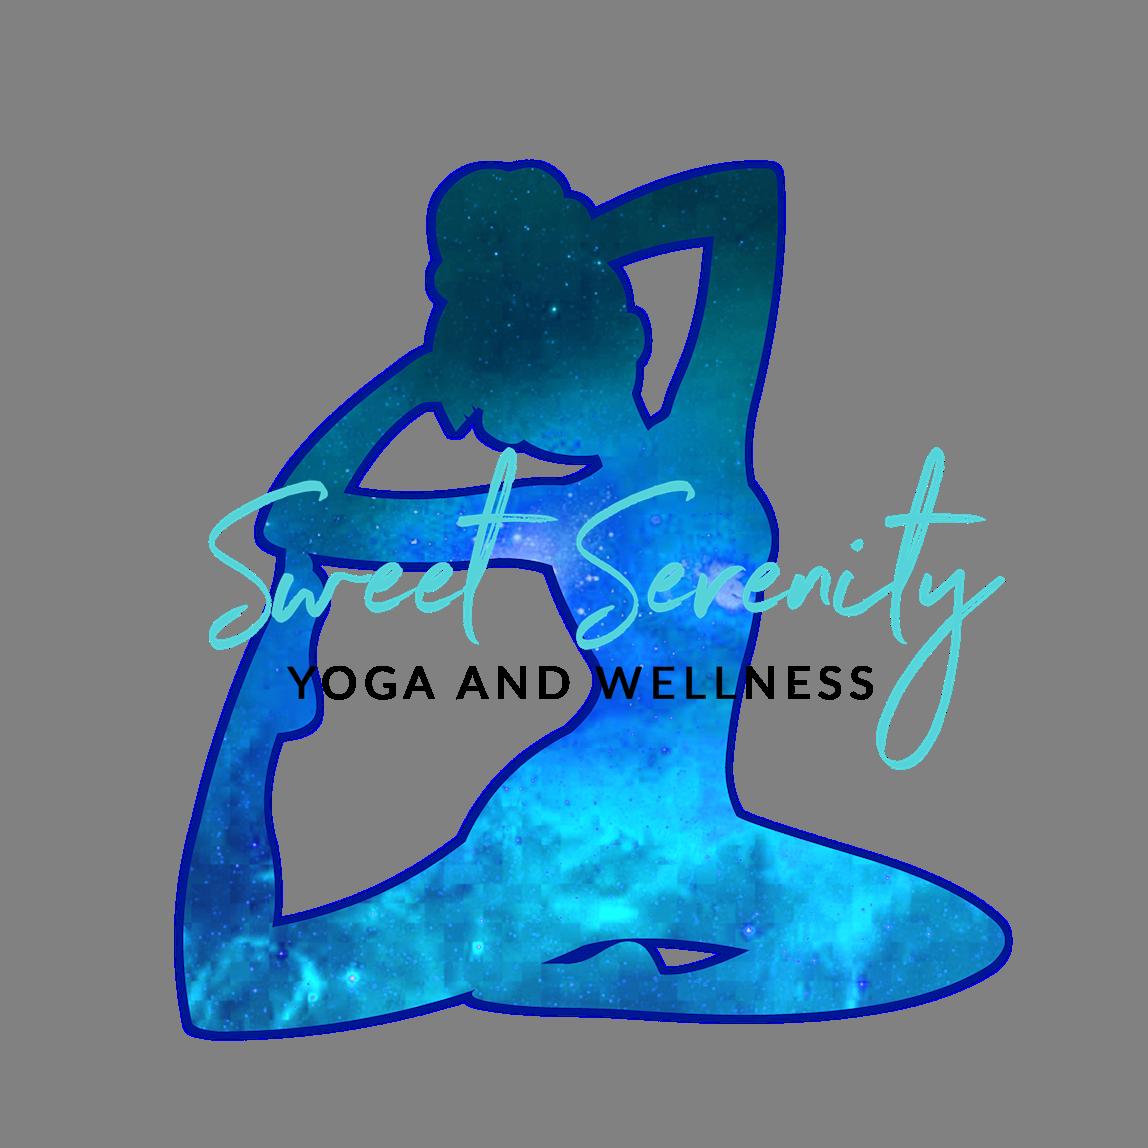 Sweet Serenity Yoga and Wellness Inc.